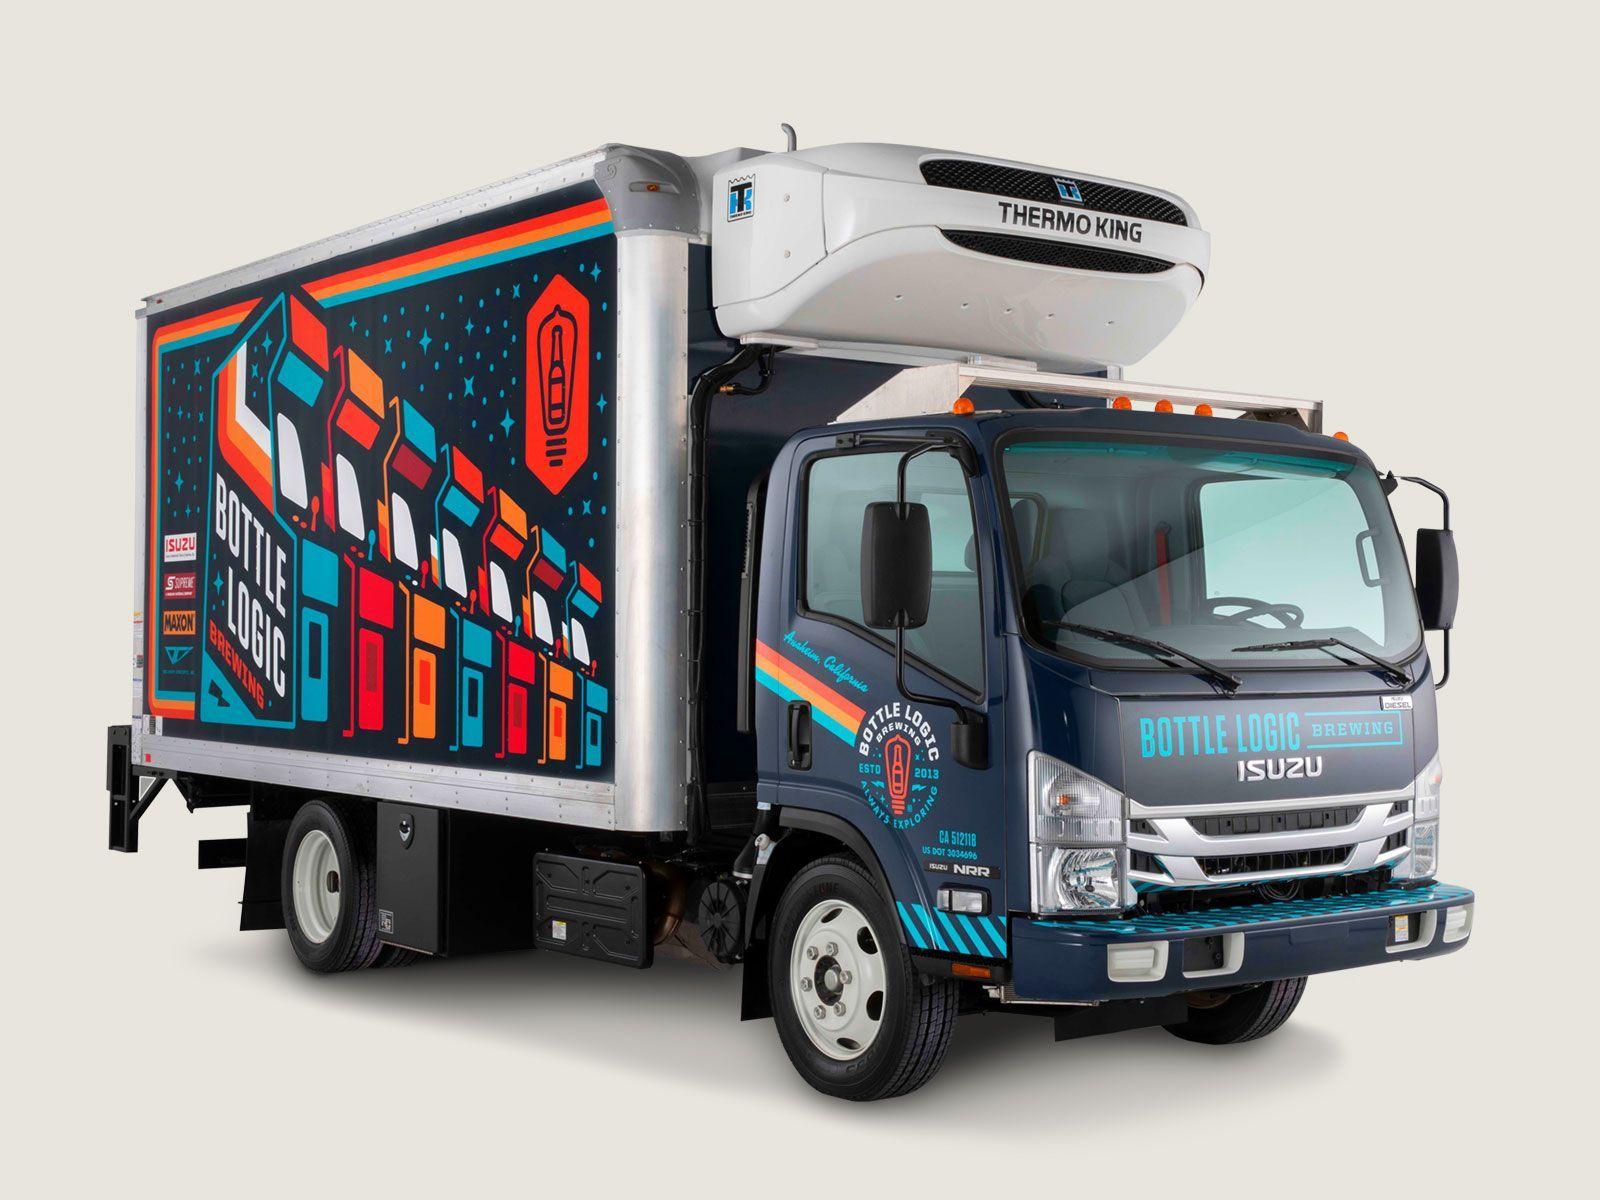 Bottle Logic Isuzu Ultimate Beer Truck Beer Truck Truck Design Beer Station